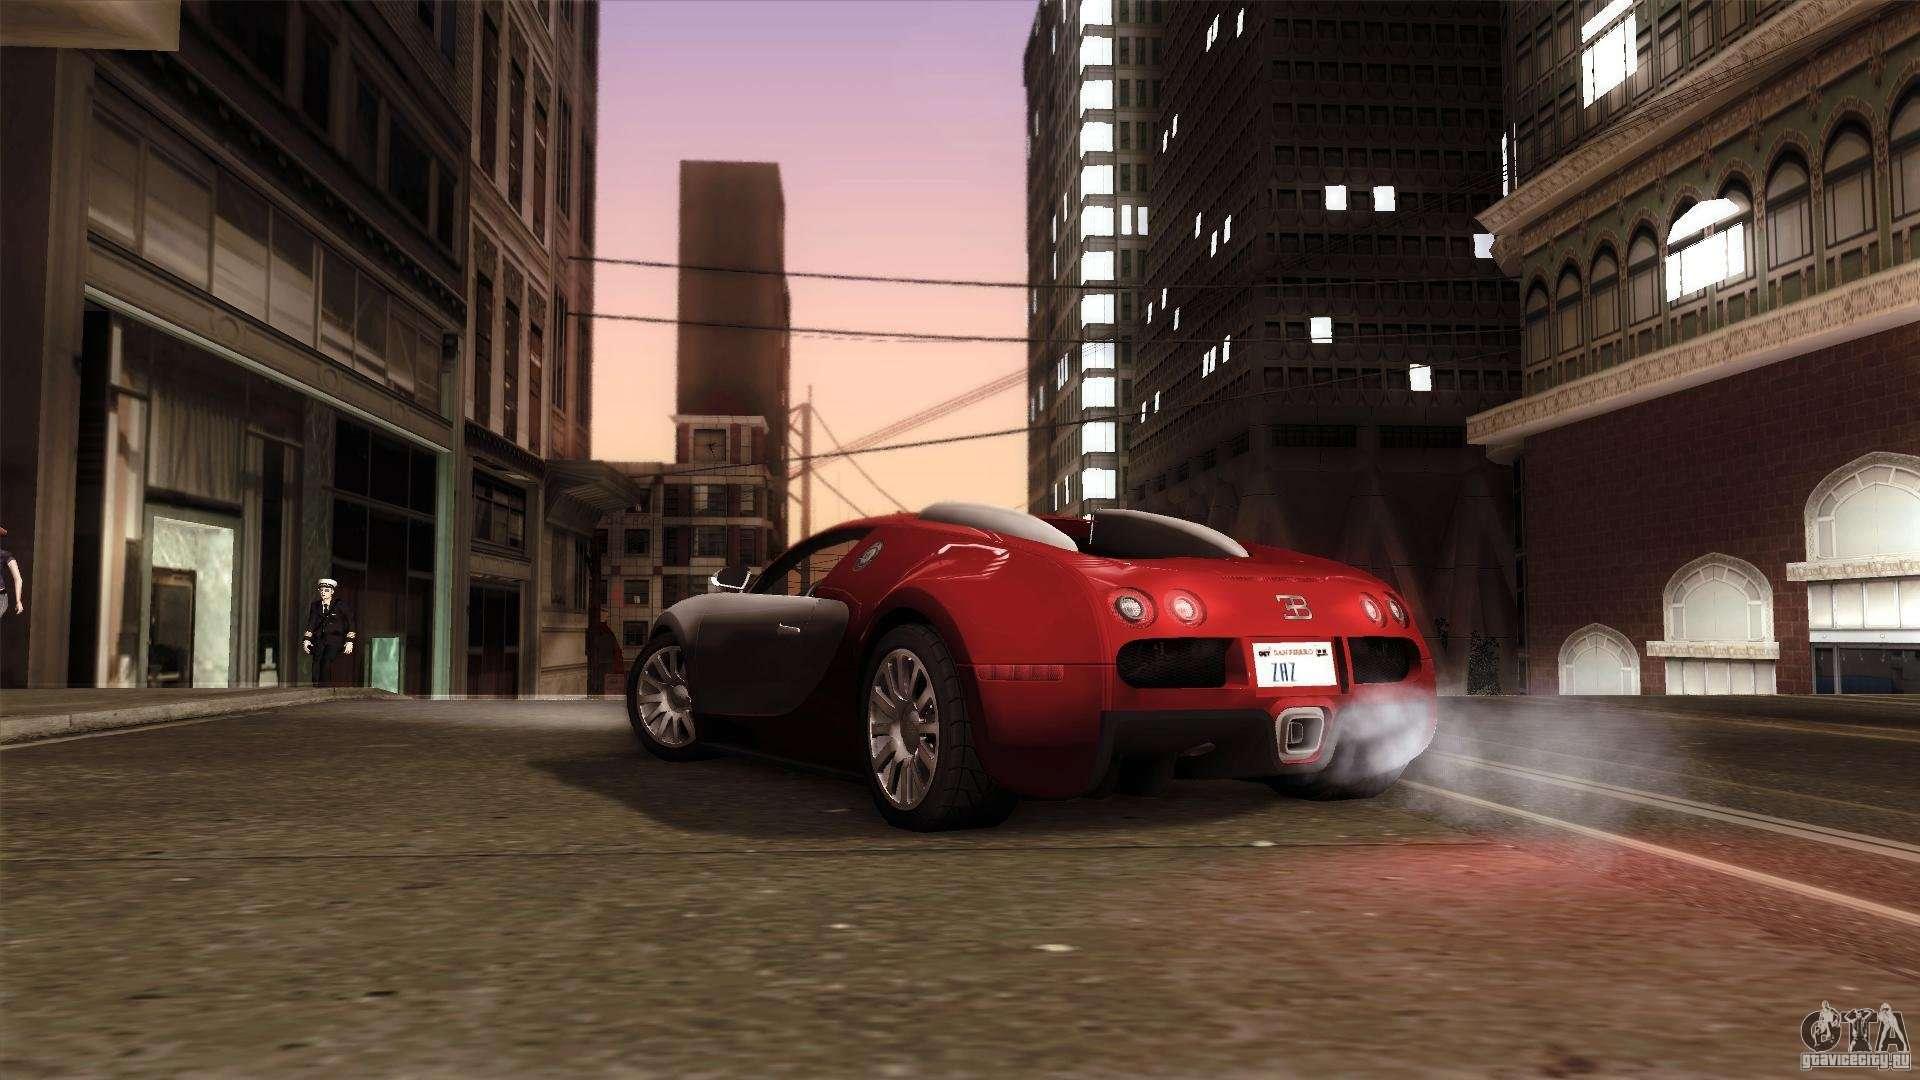 47509-1346245462-gta-sa2012-08-2916-40-05-82 Terrific Bugatti Veyron Mod Gta Sa Cars Trend